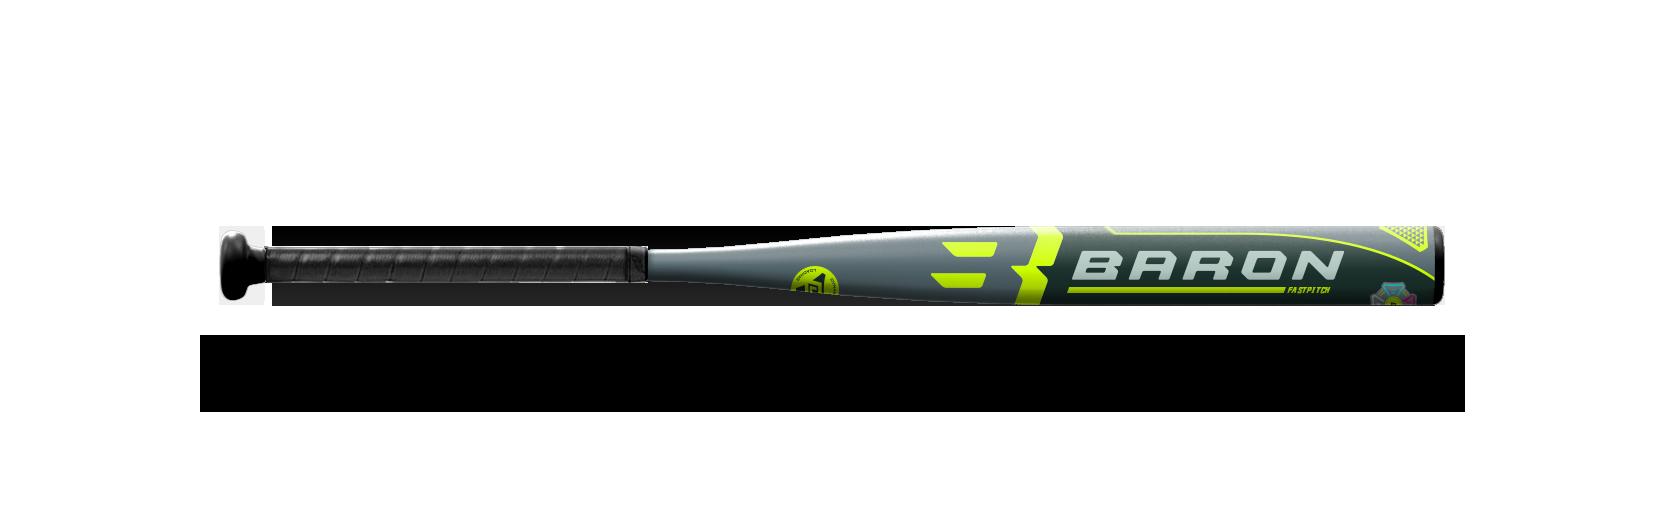 Fastpitch bat graphics softball design